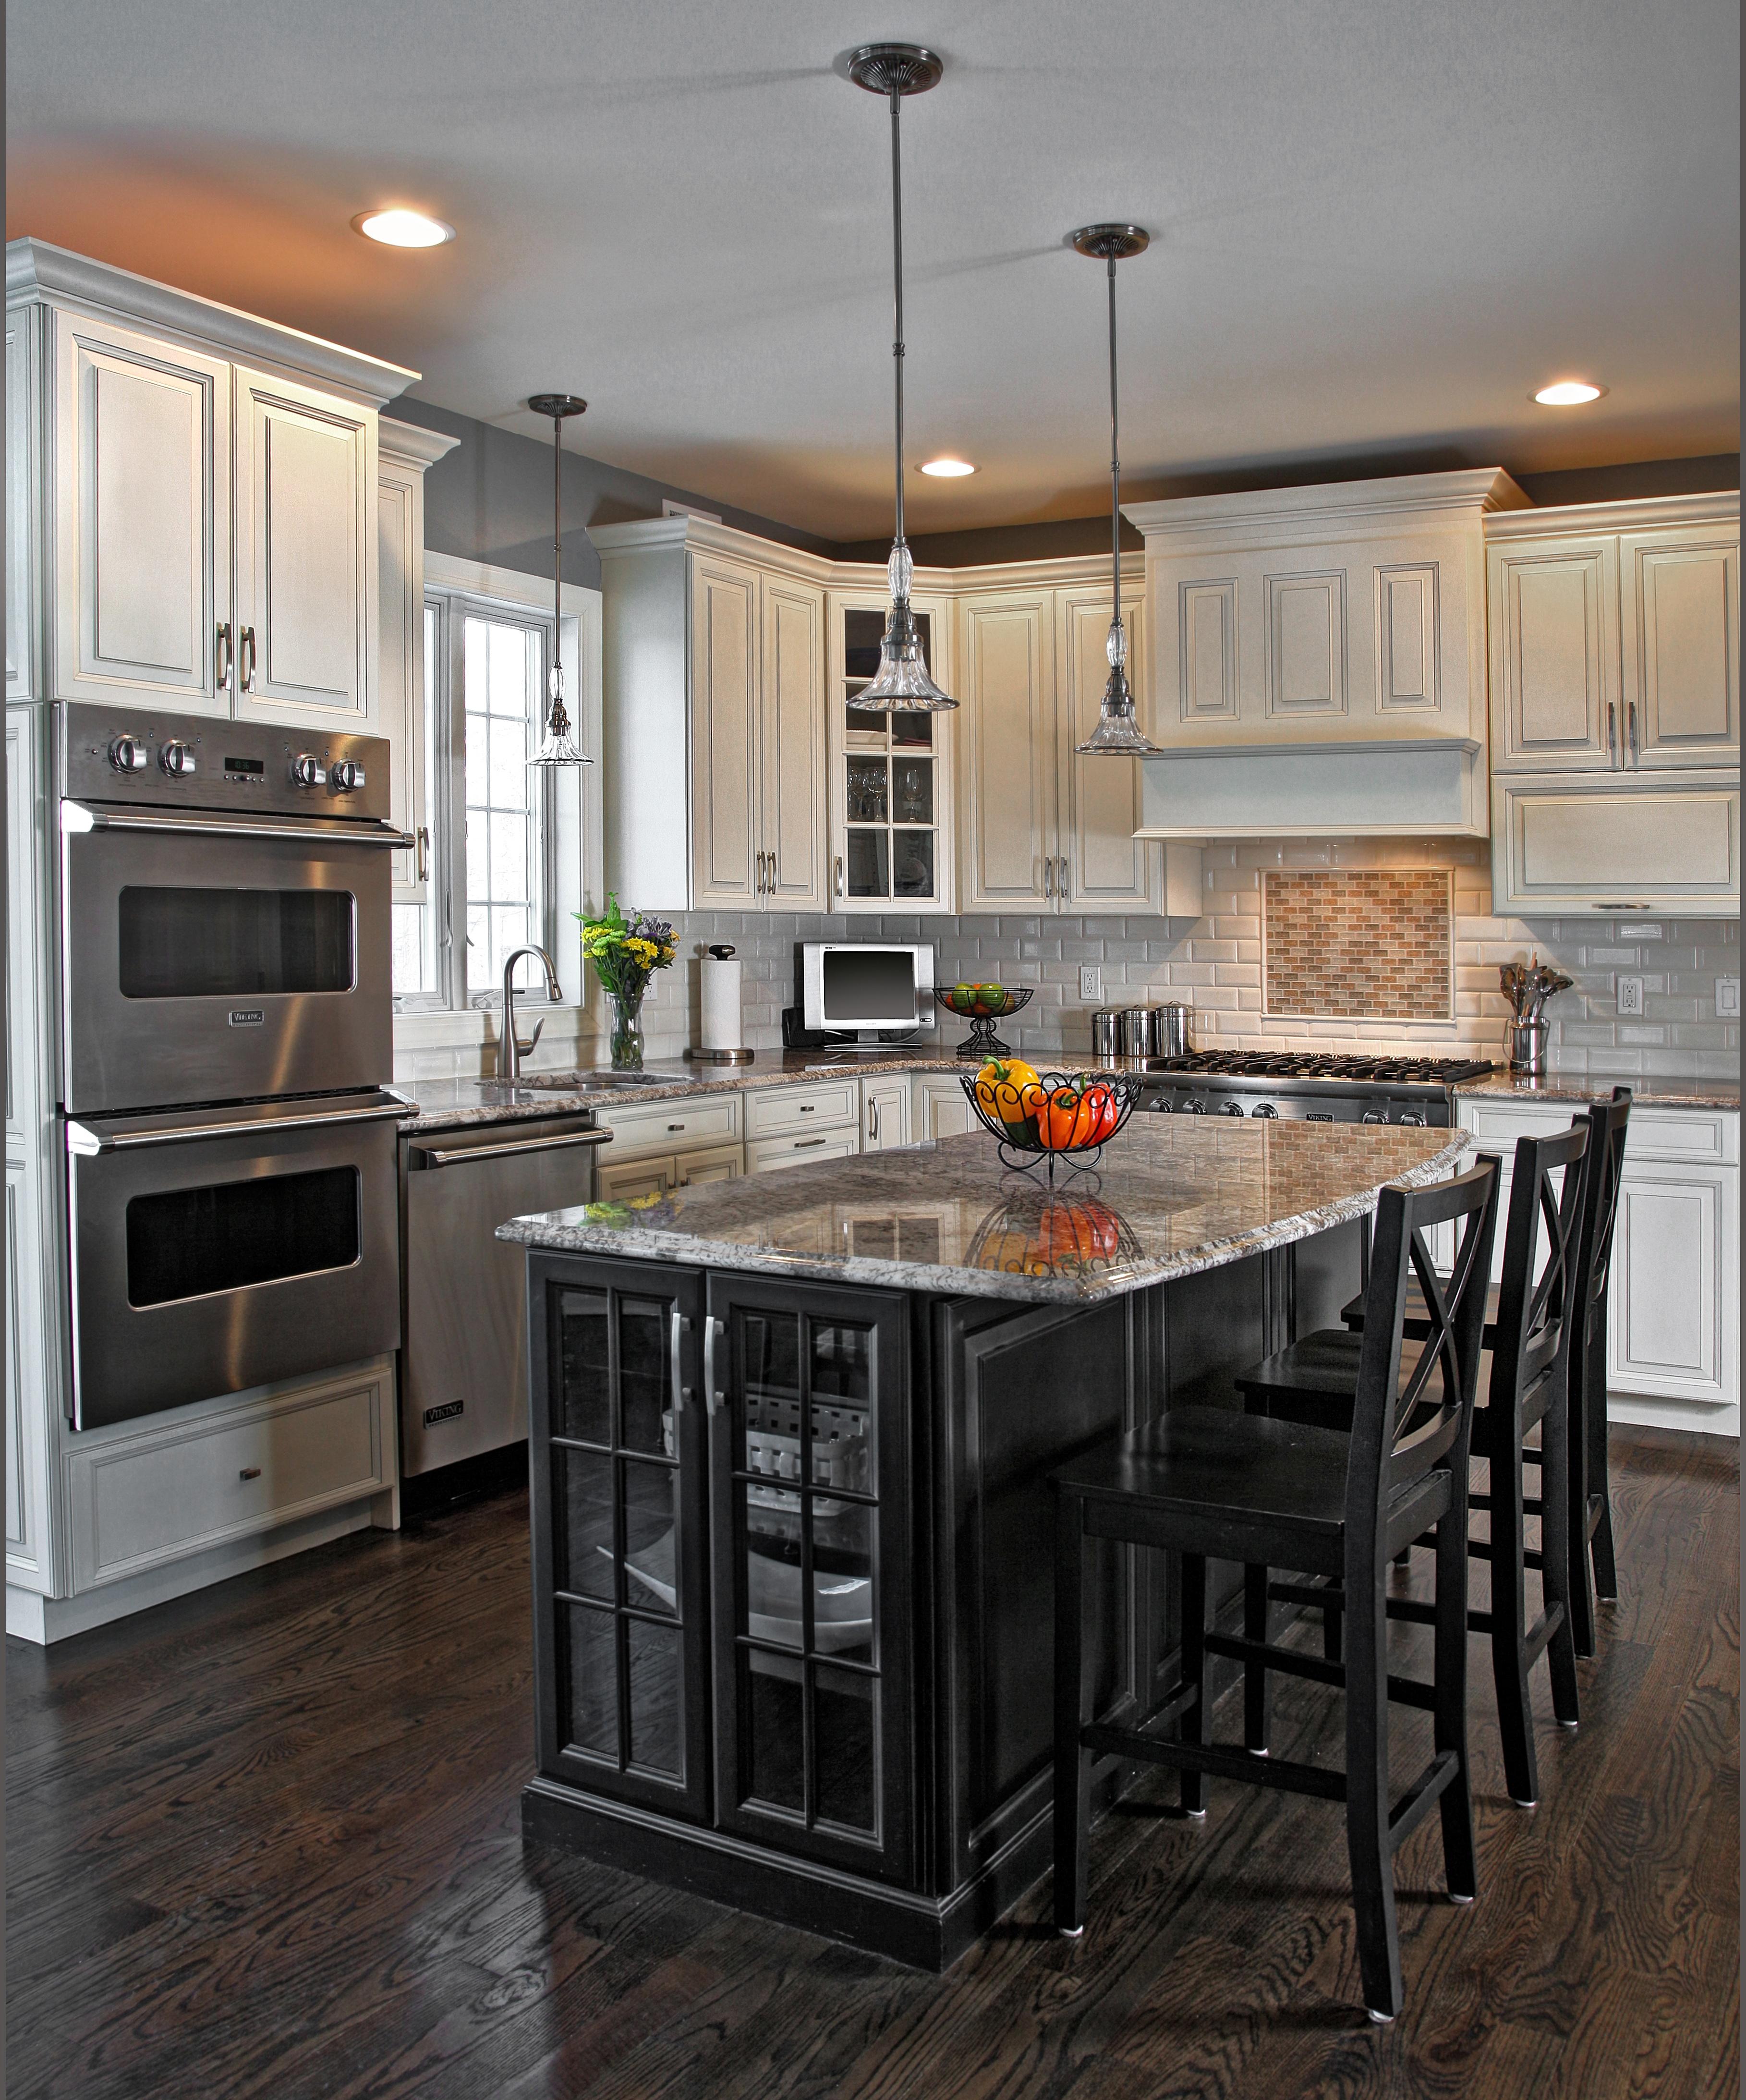 The Light Stuff - Fabulous, Functional Kitchen Lighting